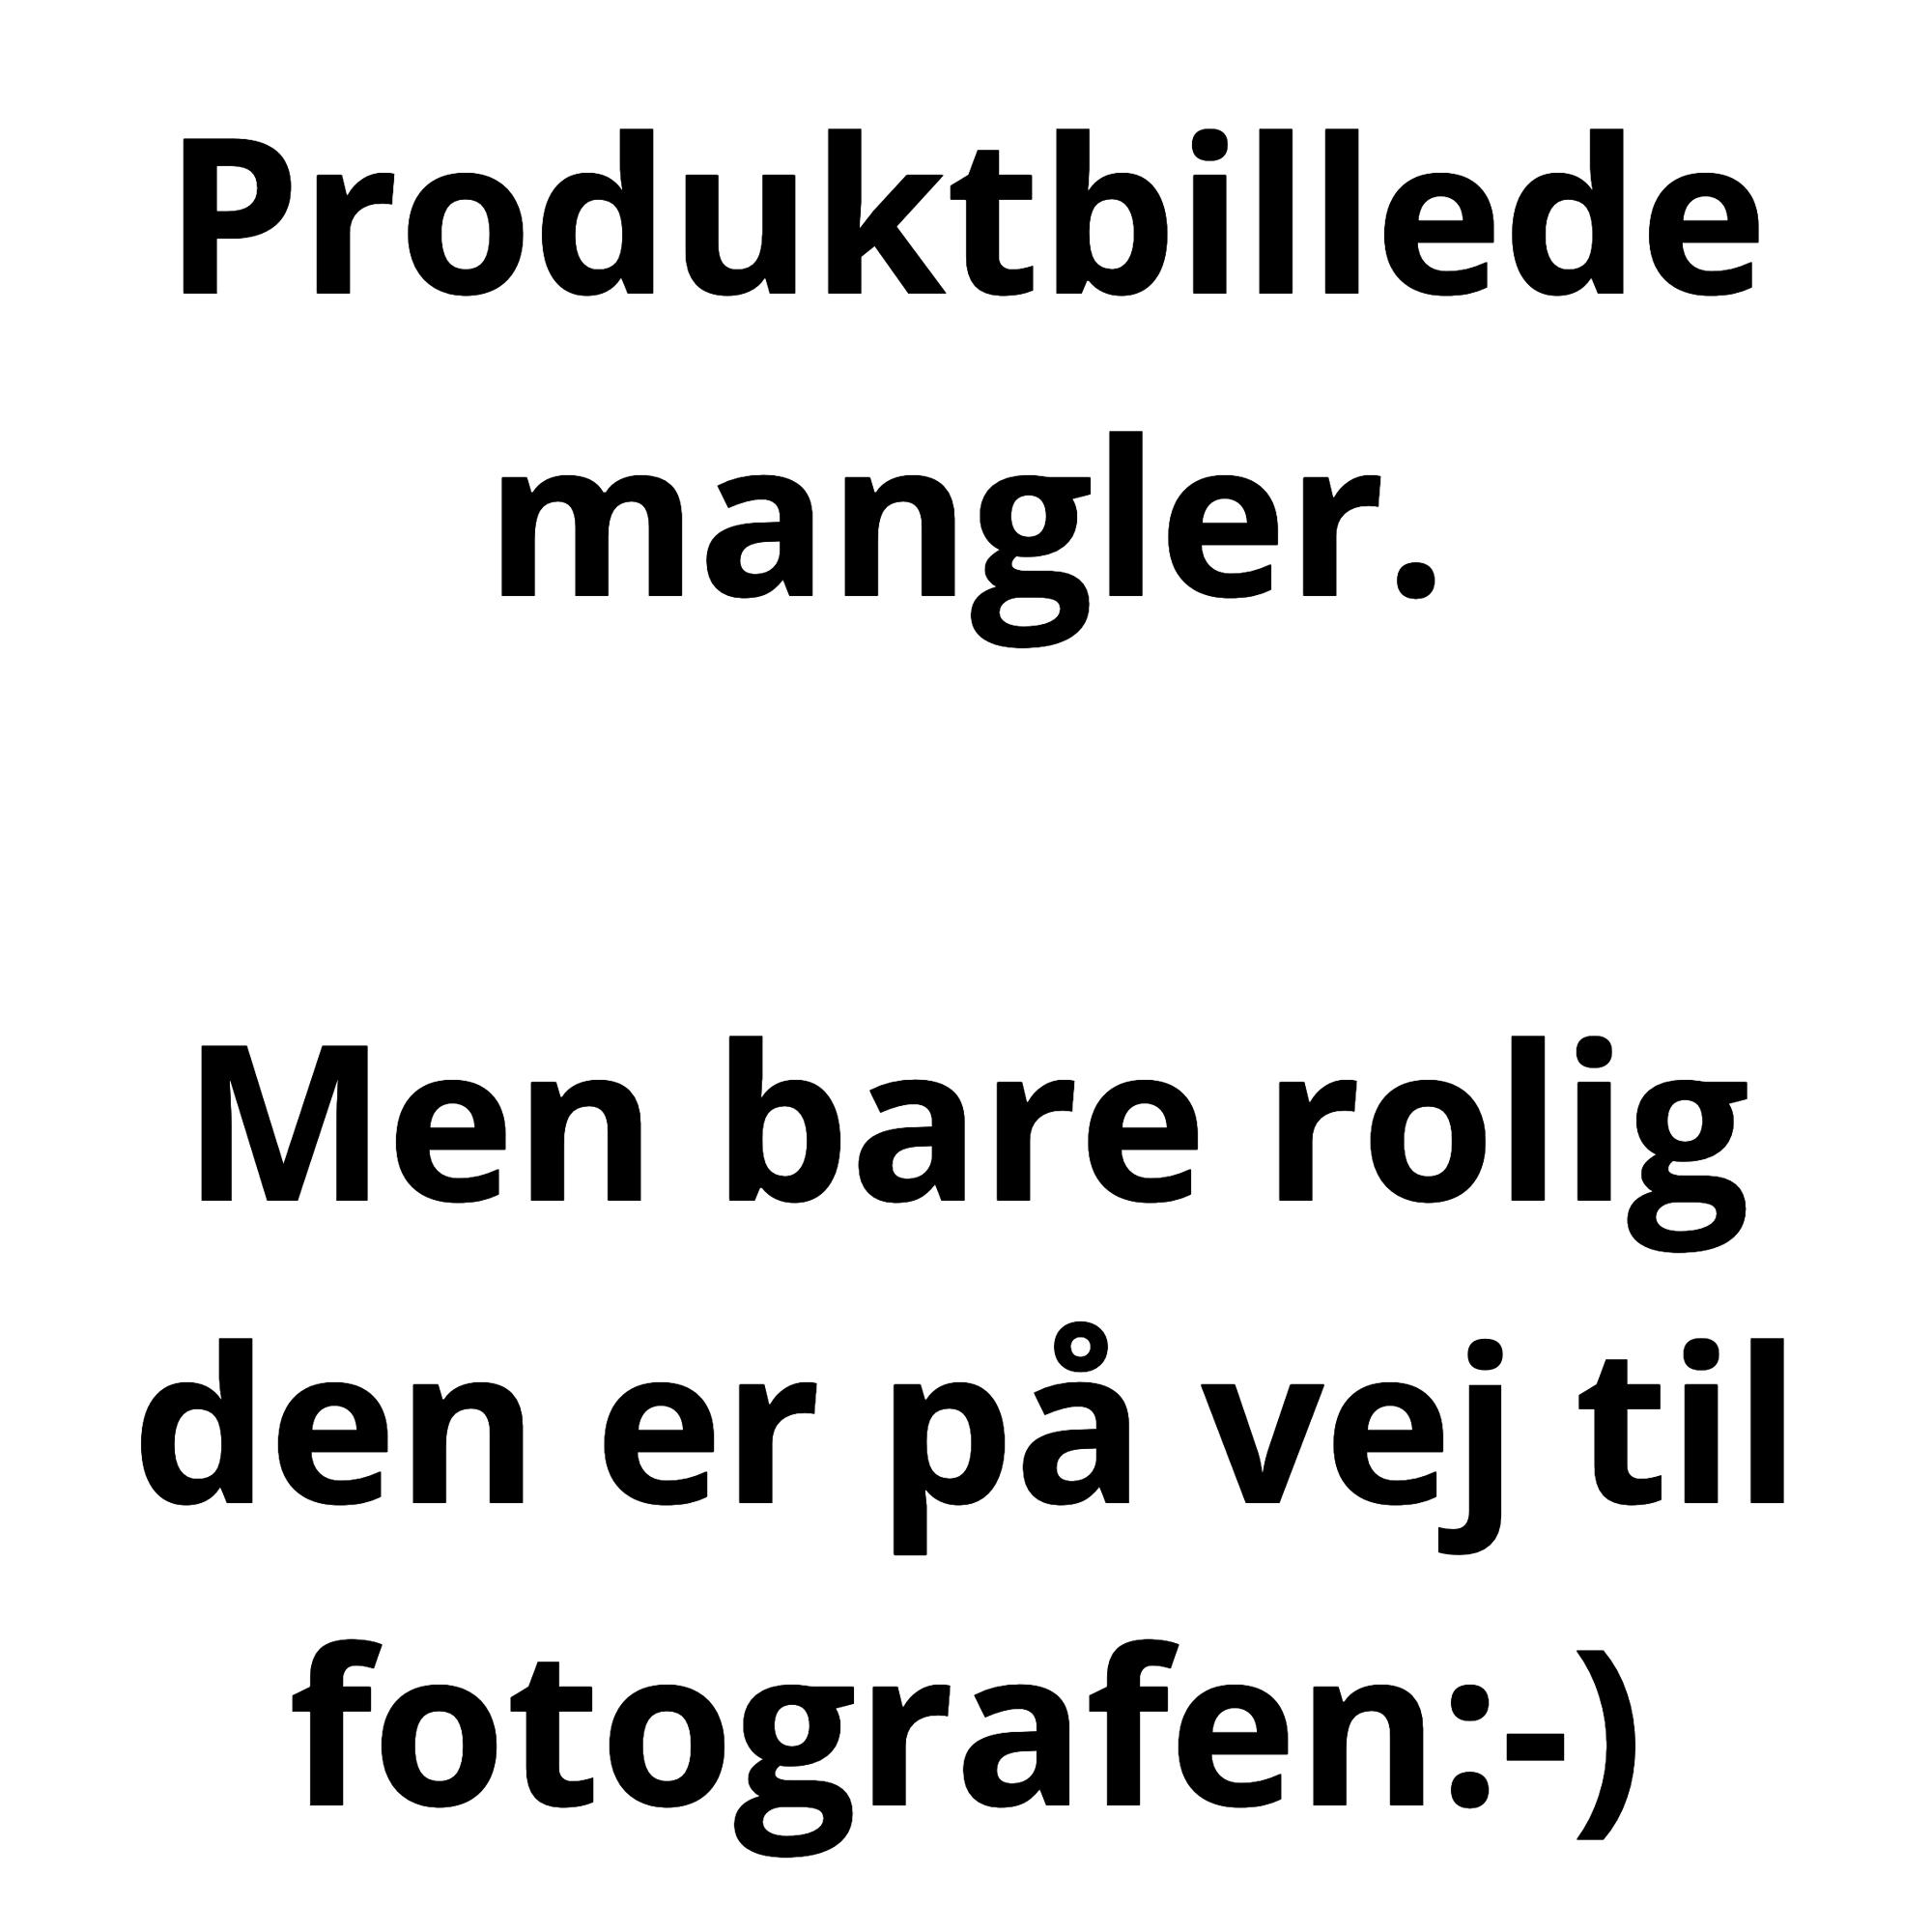 Brodit Passiv Tablet mobilholder til Samsung Galaxy Note PRO 12.2 og Samsung Galaxy Tab PRO 12.2 - 511610